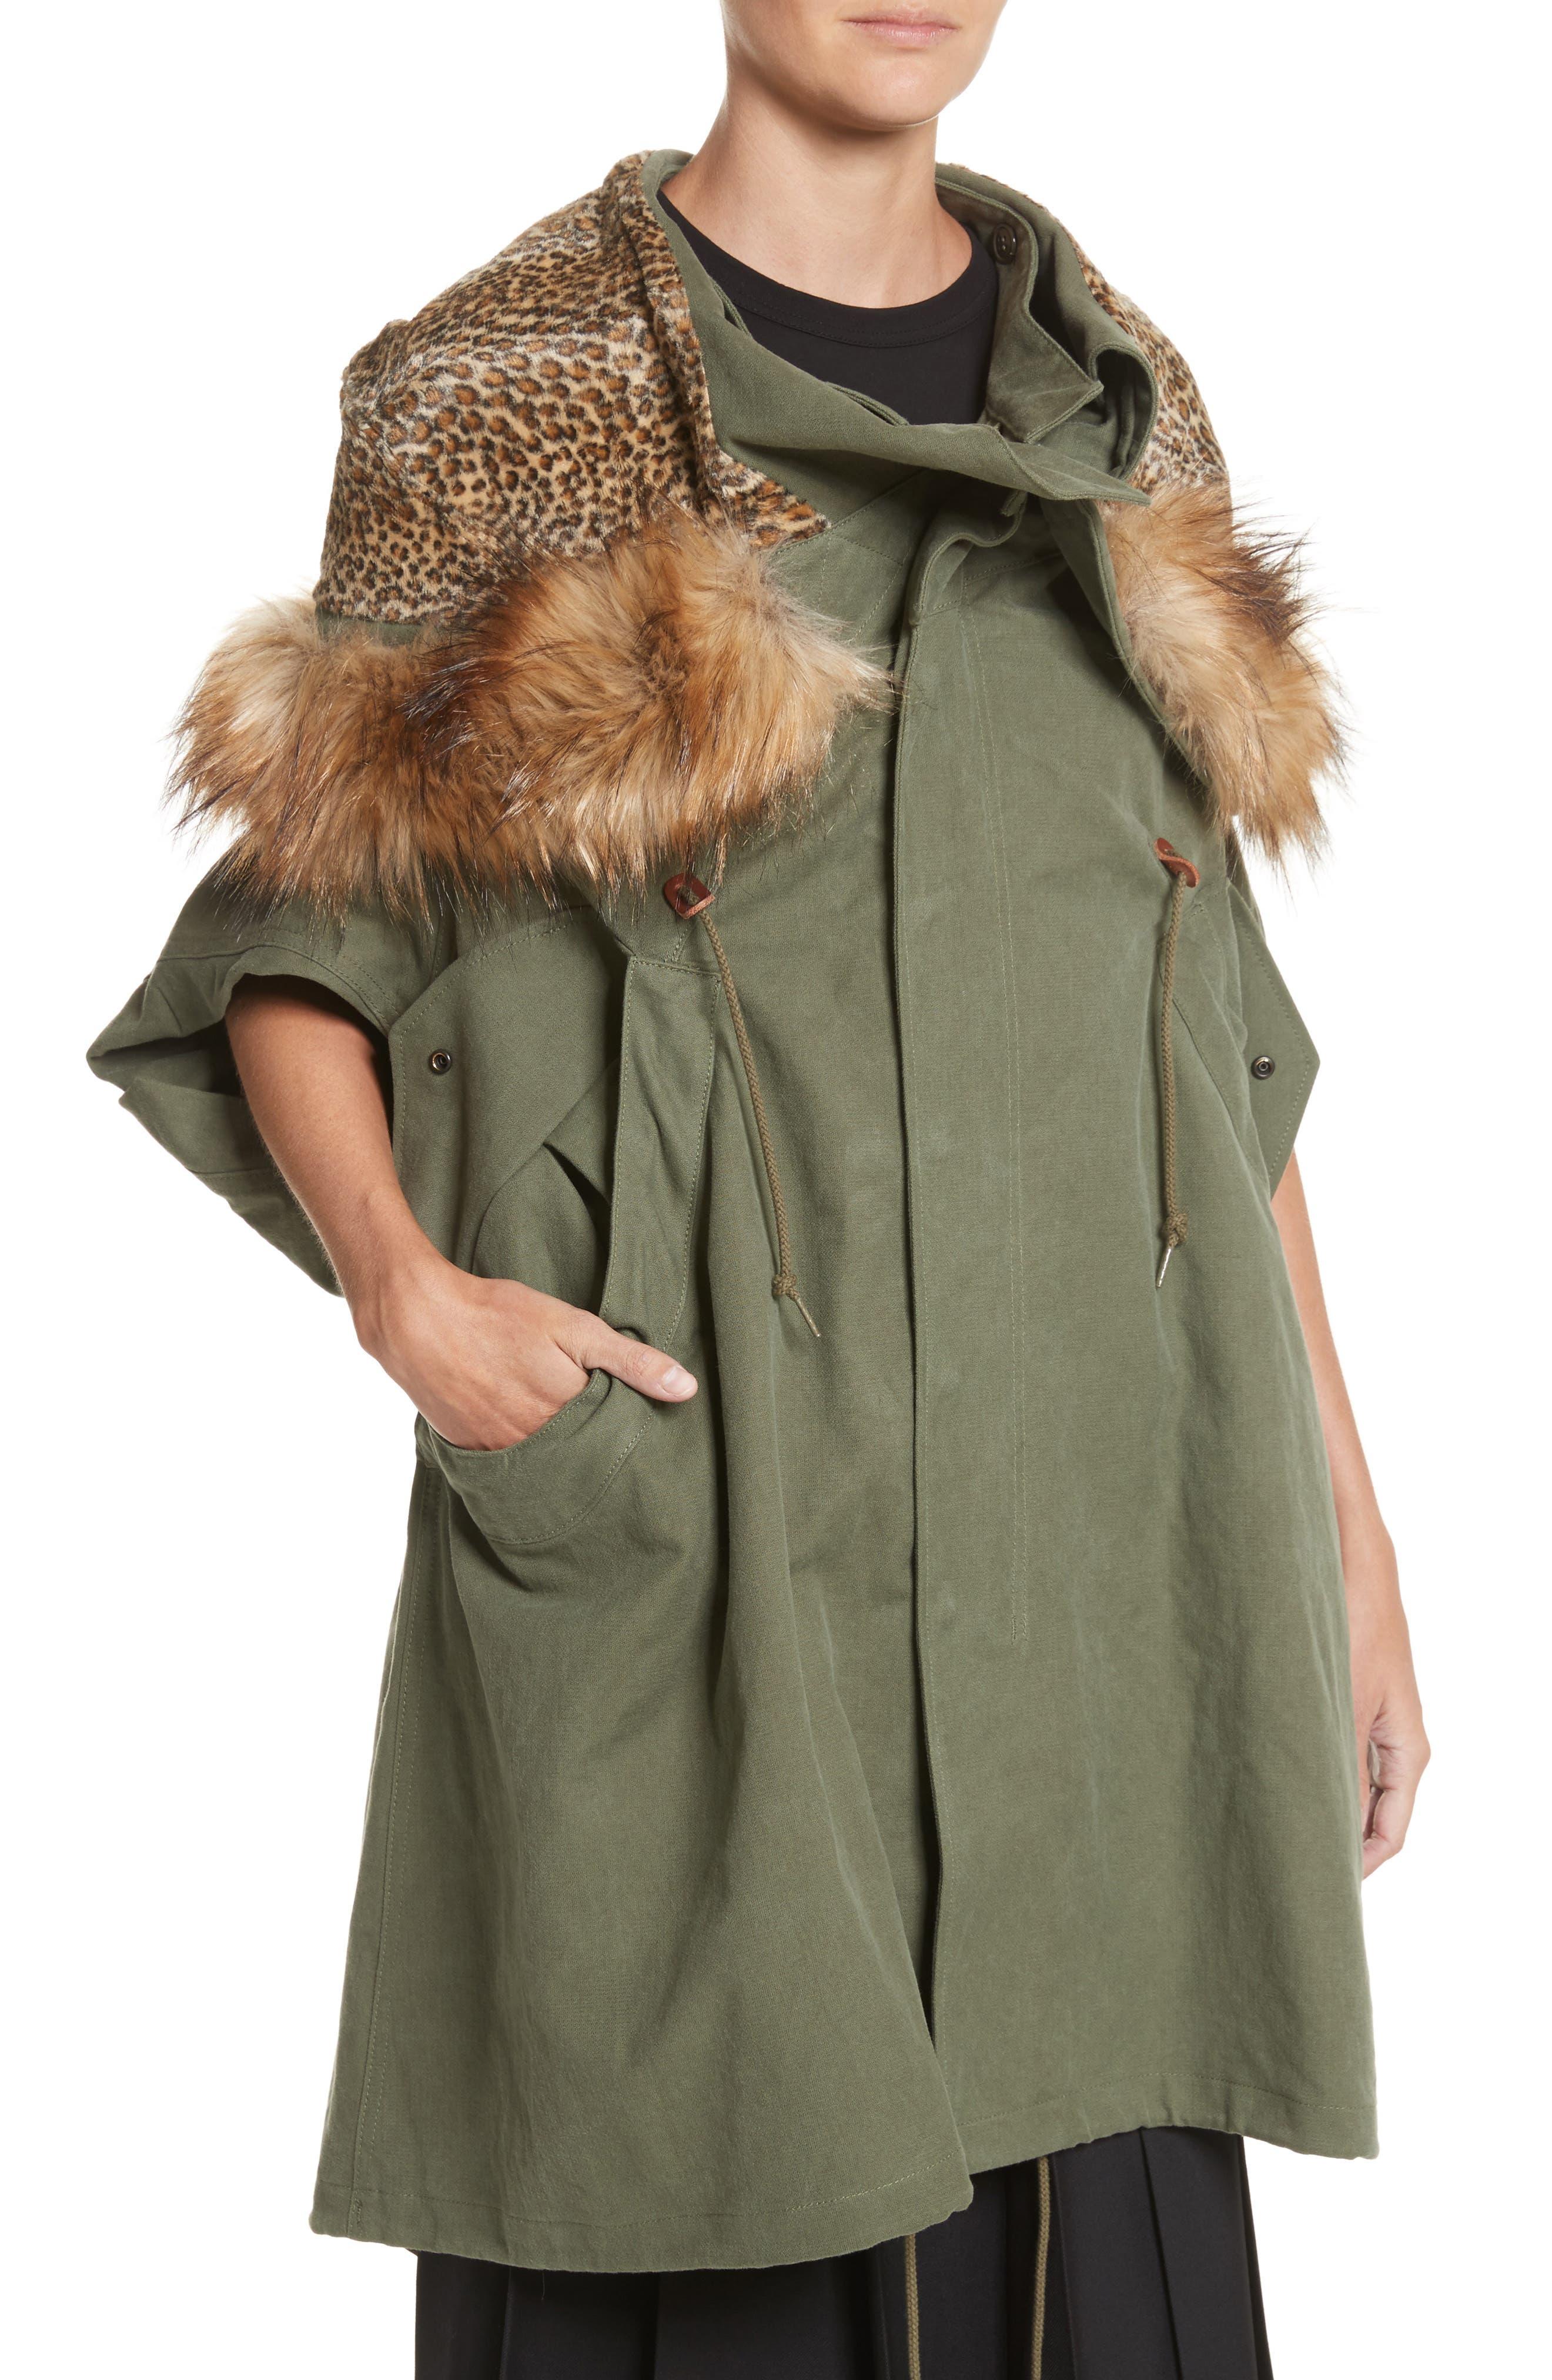 Army Coat with Cheetah Faux Fur Hood,                             Alternate thumbnail 4, color,                             340